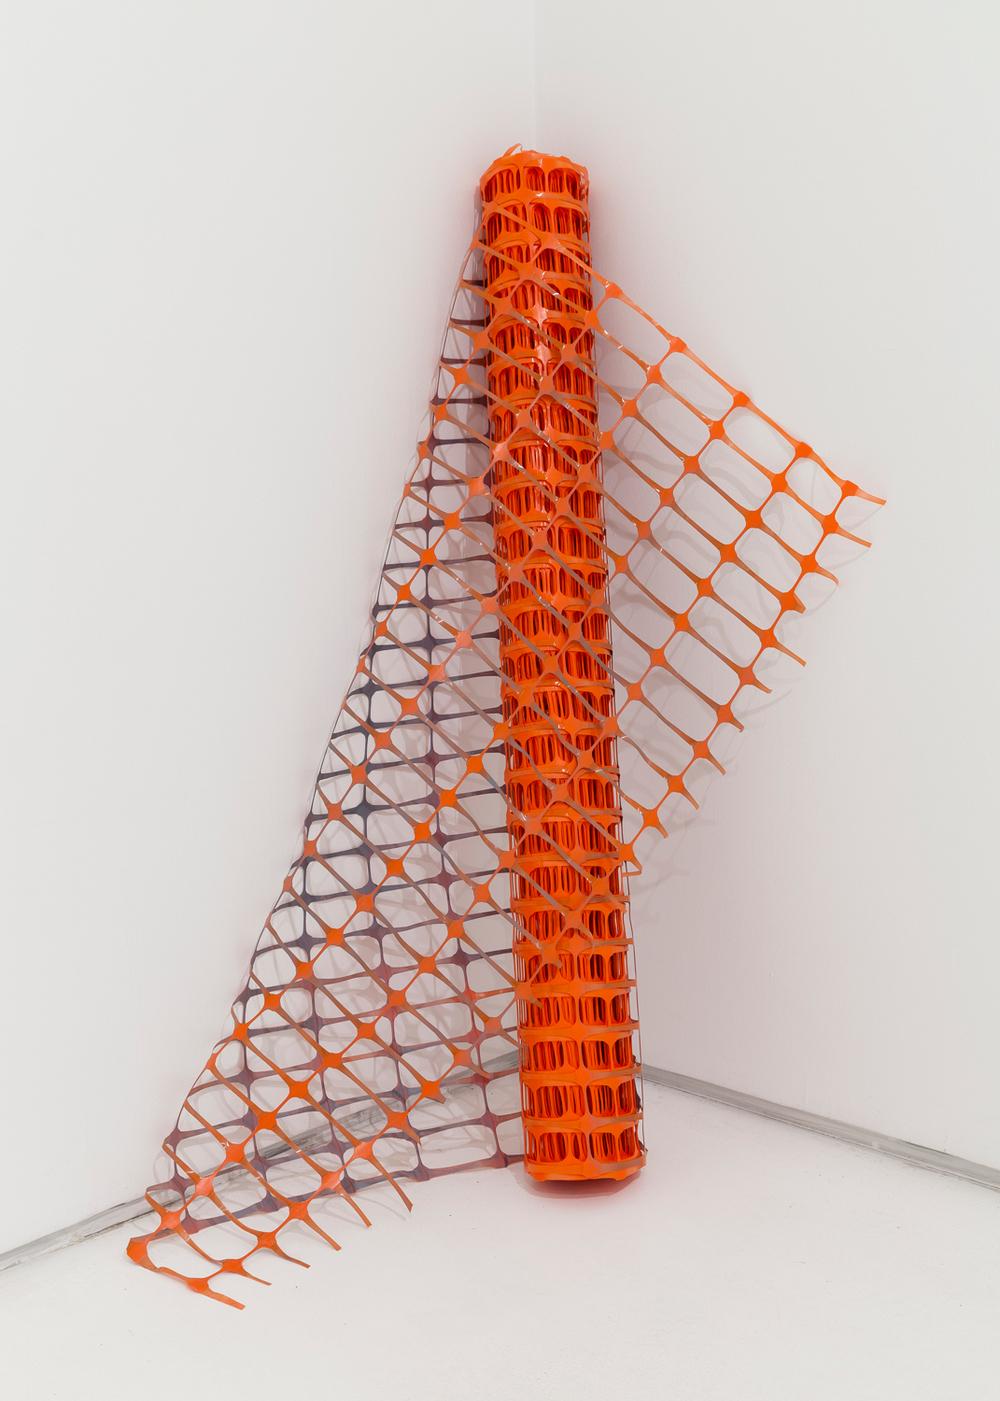 kim-beck-fences-10.jpg